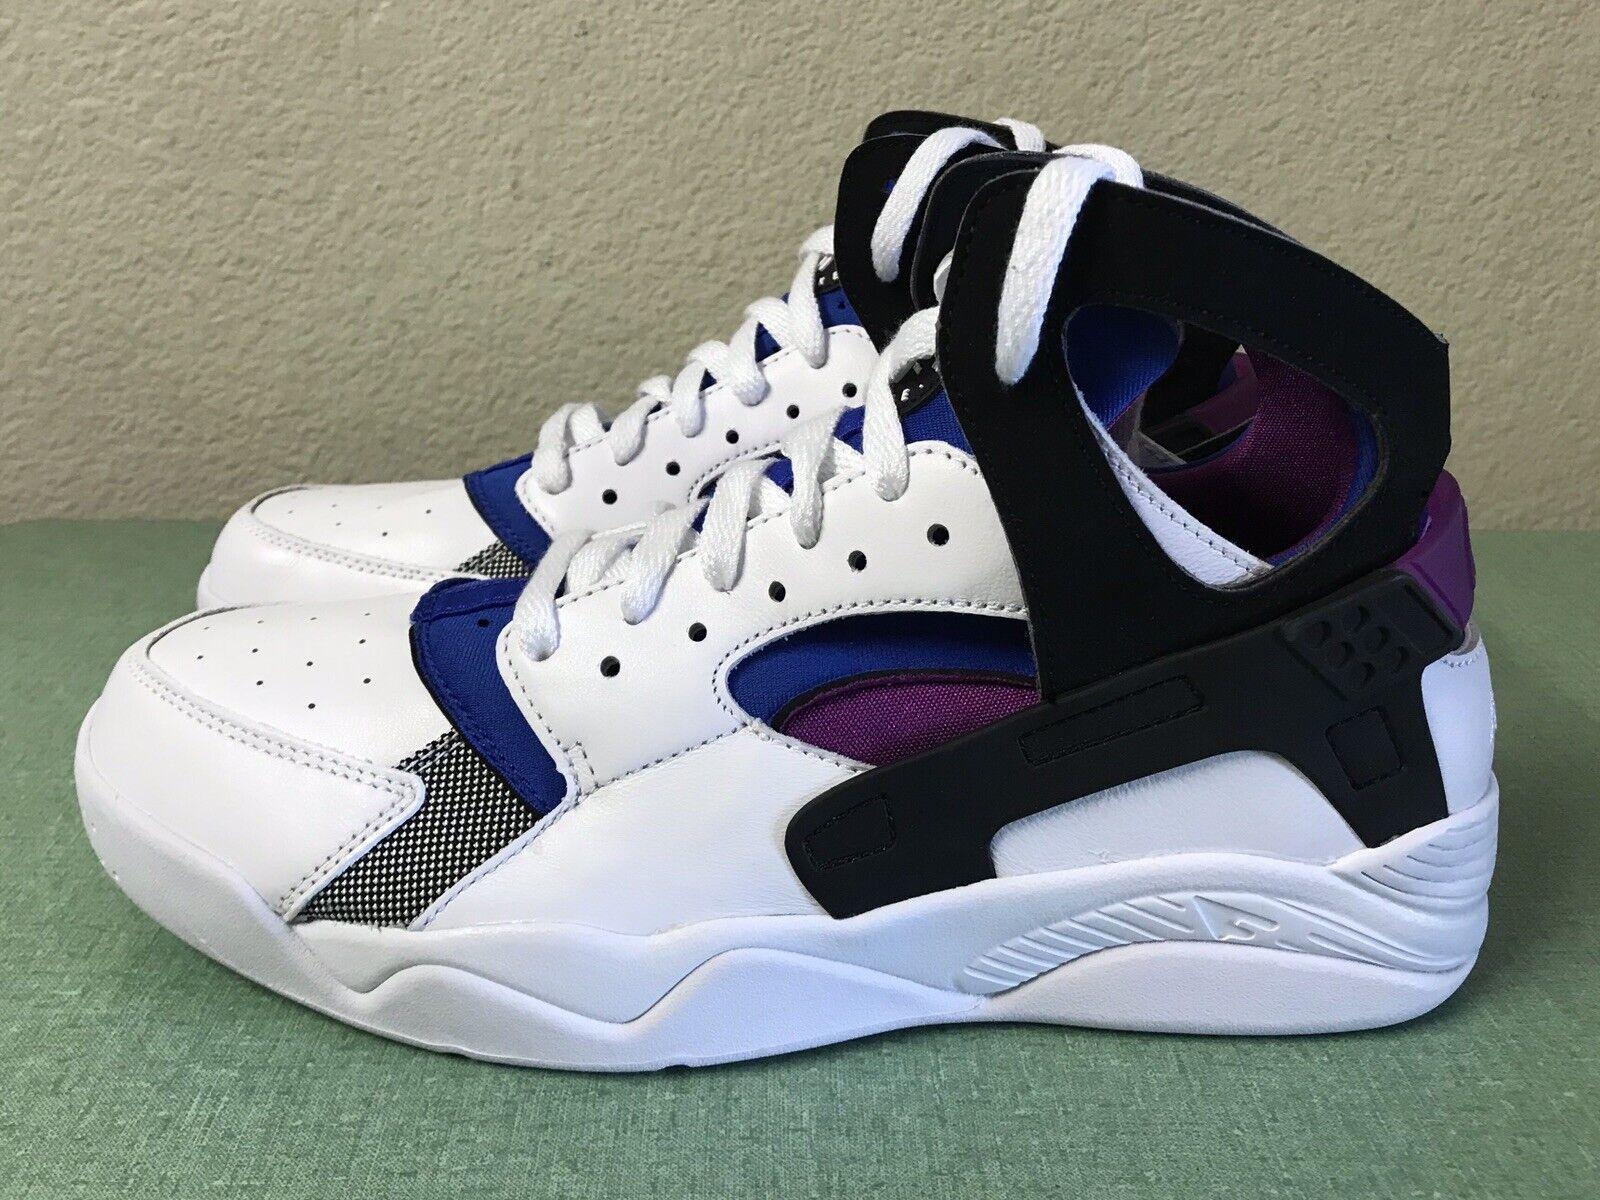 Nike Air Flight Huarache PRM QS Noir Blanc Bleu Violet Homme Sz 10 Basketball